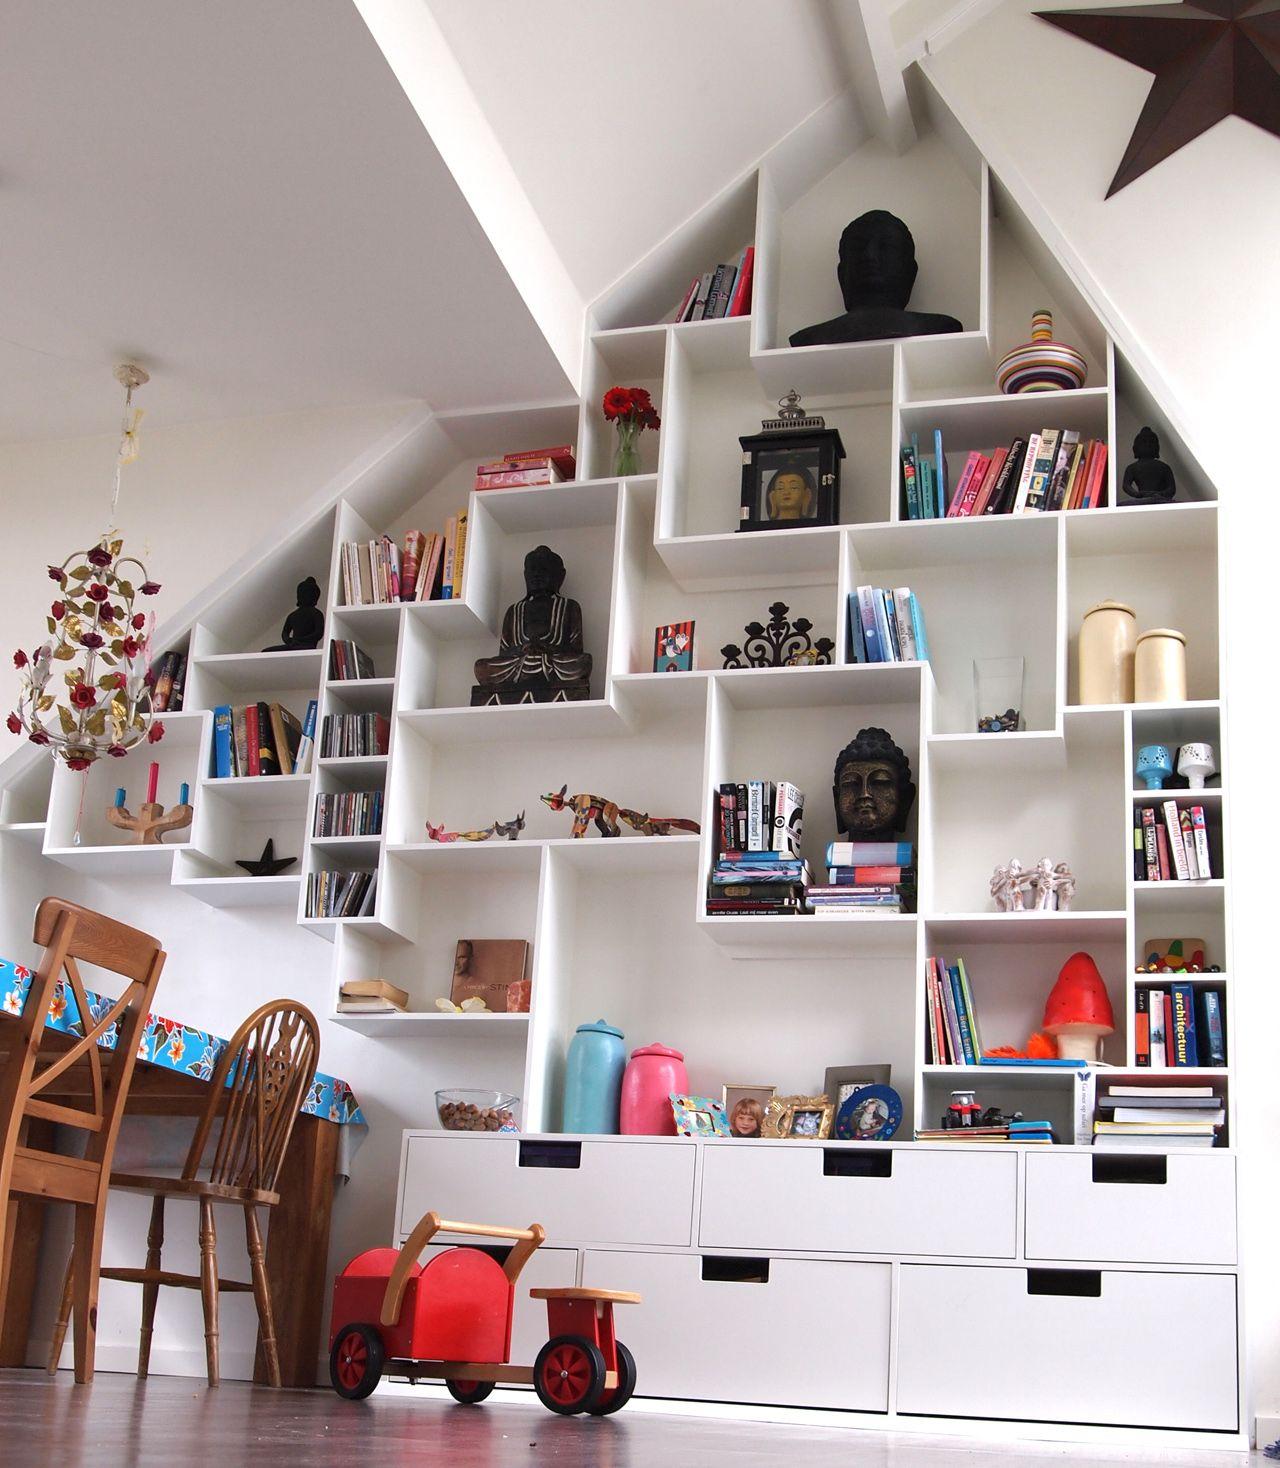 1000+ images about ideeen slaapkamer on Pinterest